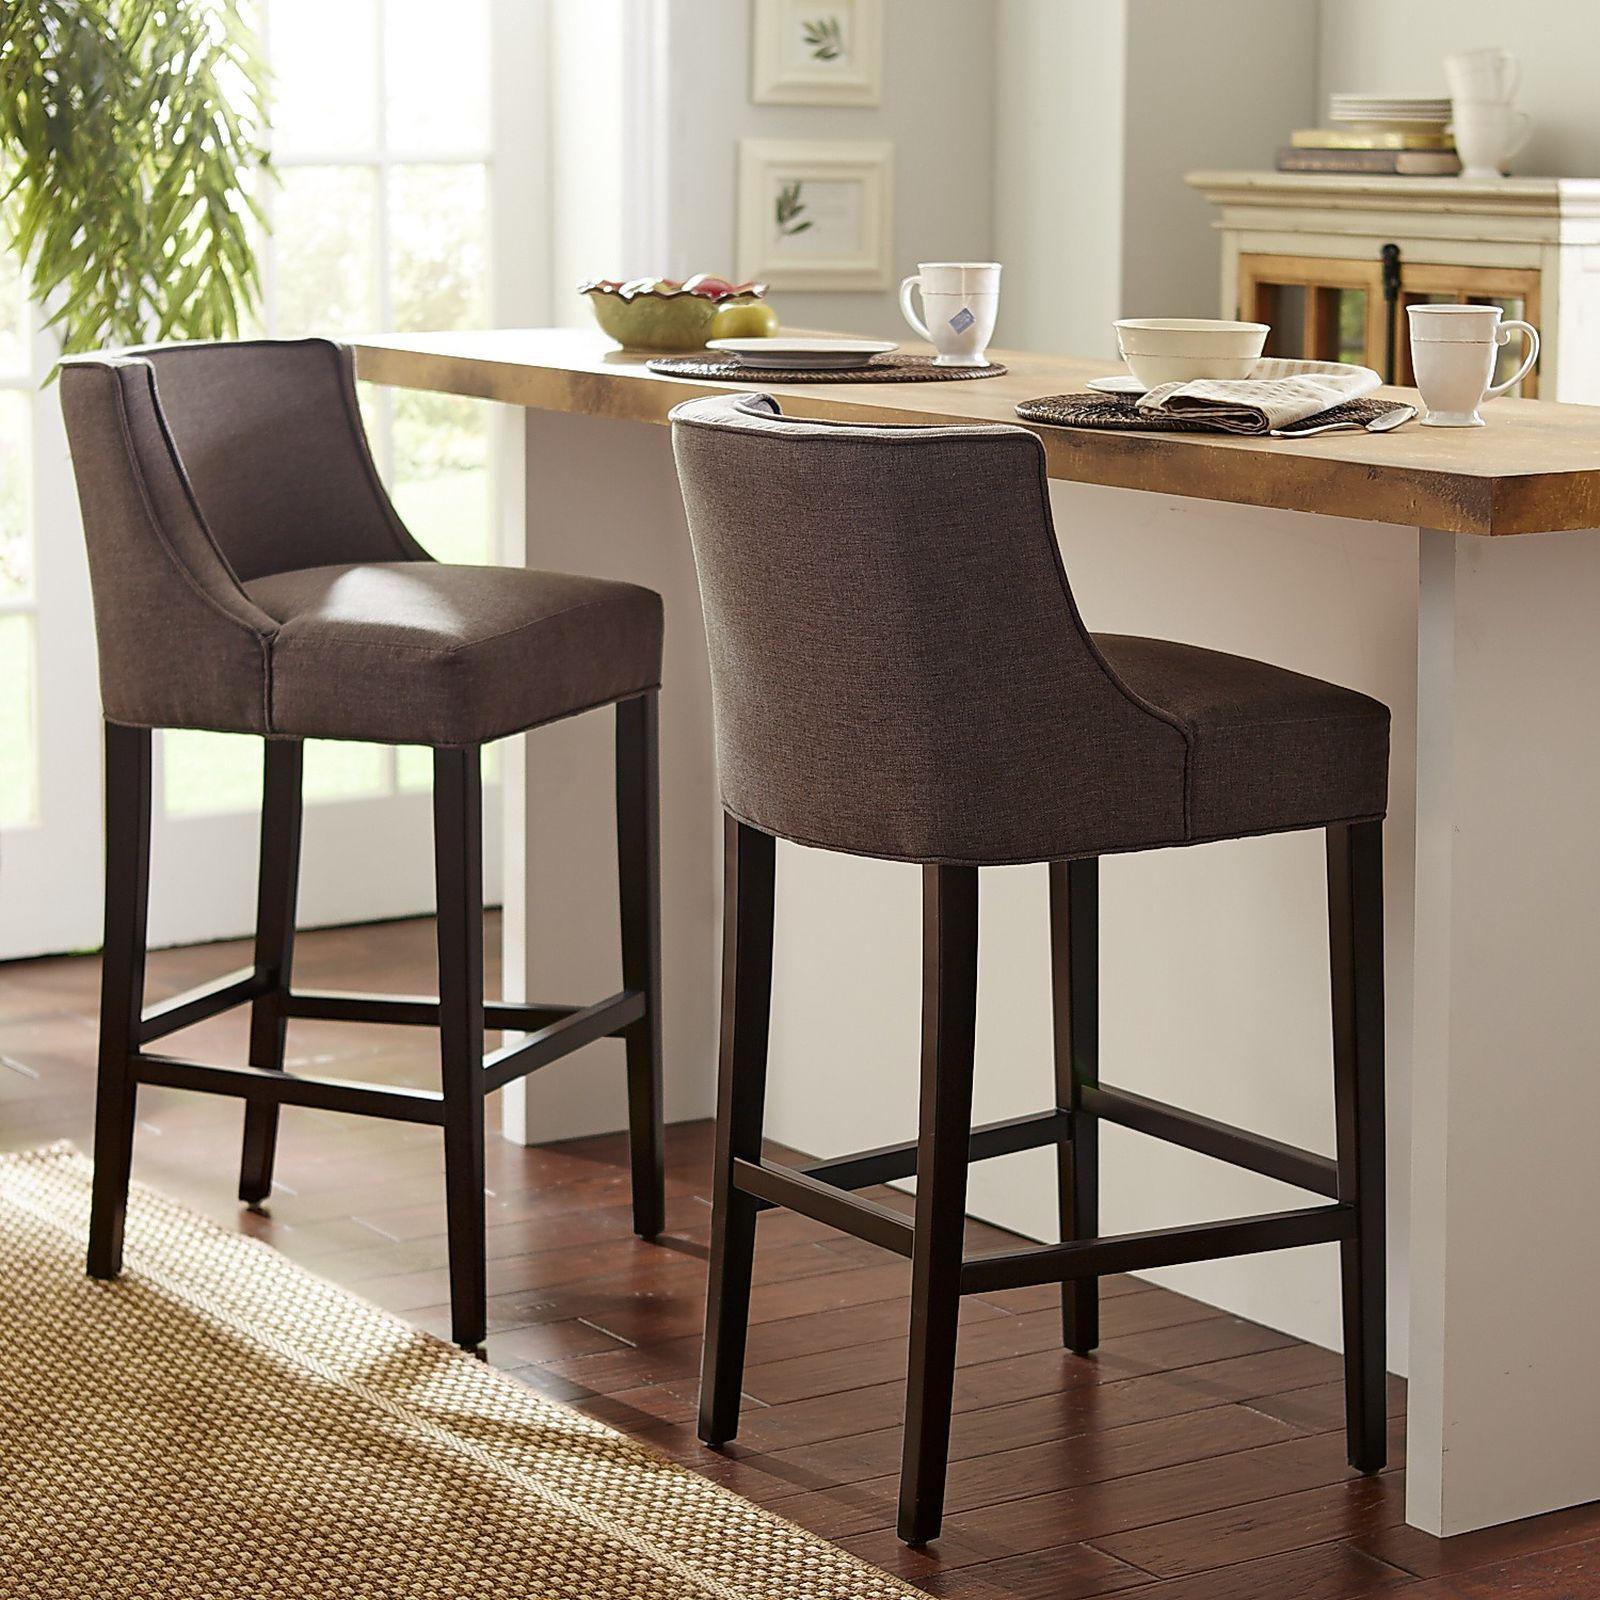 Eva Ash Bar Stool  Stools Espresso And Contemporary Simple Kitchen Counter Bar Stools Design Ideas